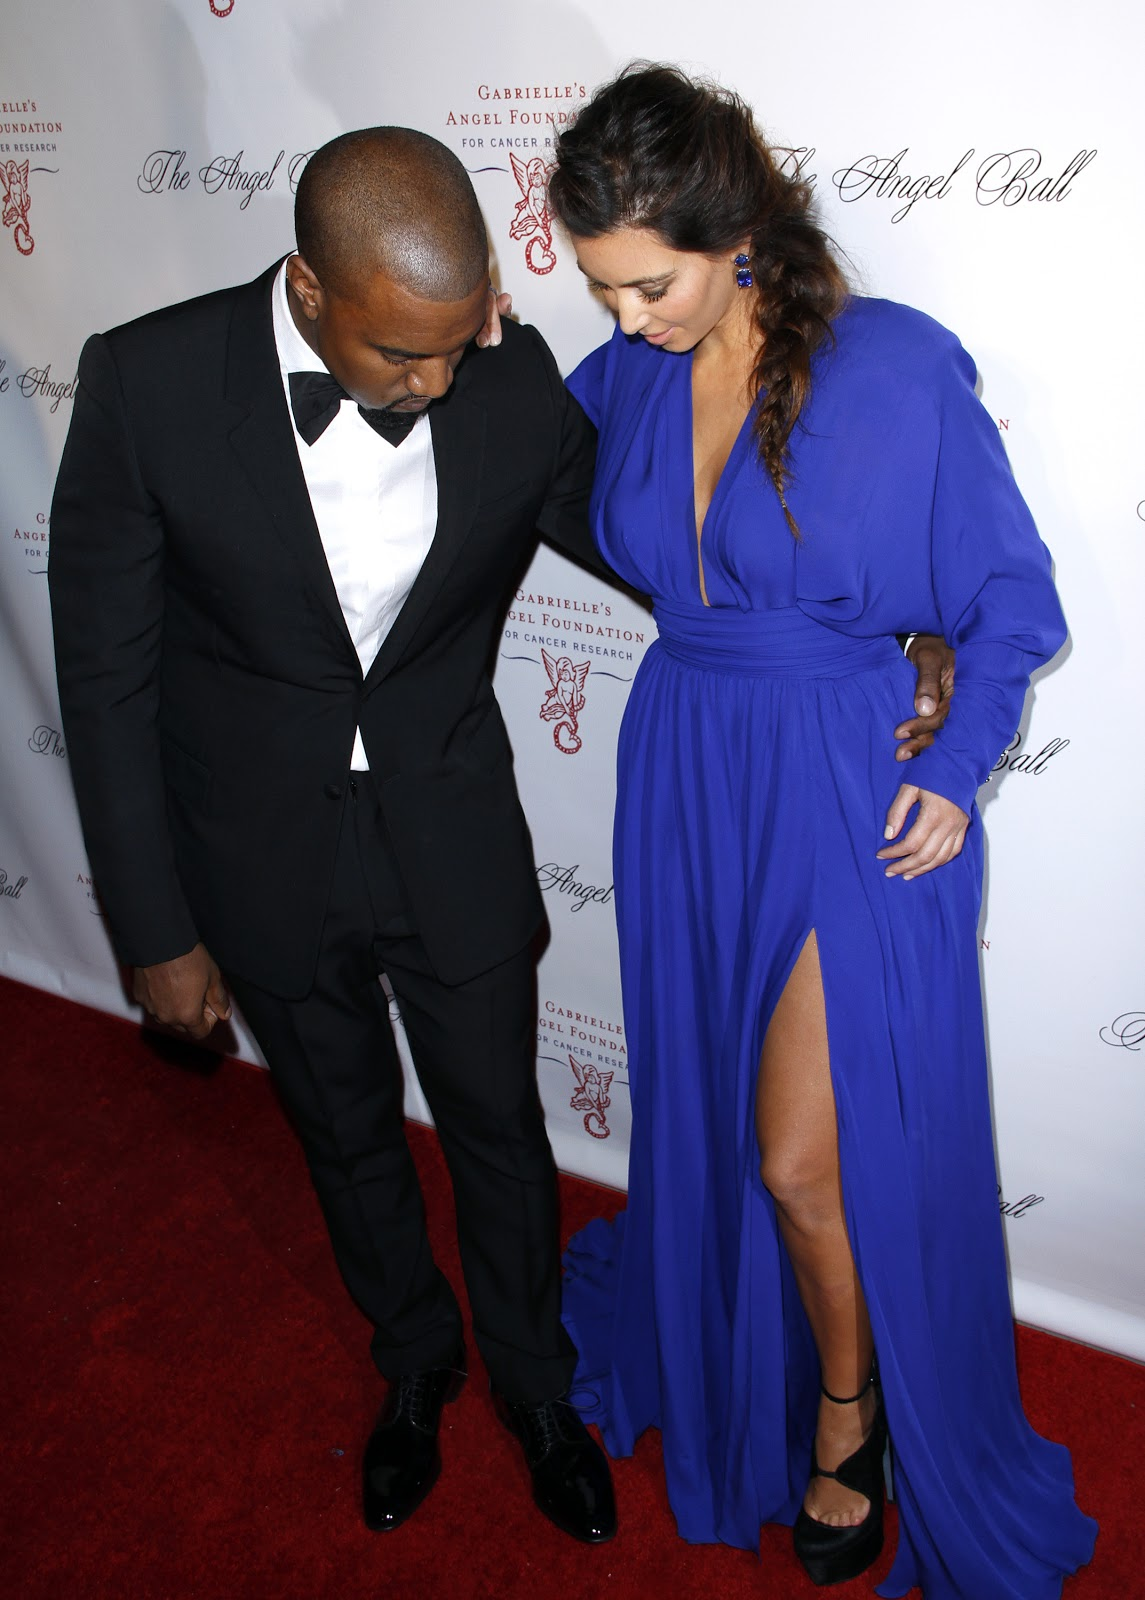 http://2.bp.blogspot.com/-RPM1fgTIBjI/UIau86LKt0I/AAAAAAAAV7Y/iE02SVt7vVA/s1600/Kim+Kardashian+attends+Angel+Ball+2012+in+New+York+City+October+22,+2012+-07.jpg